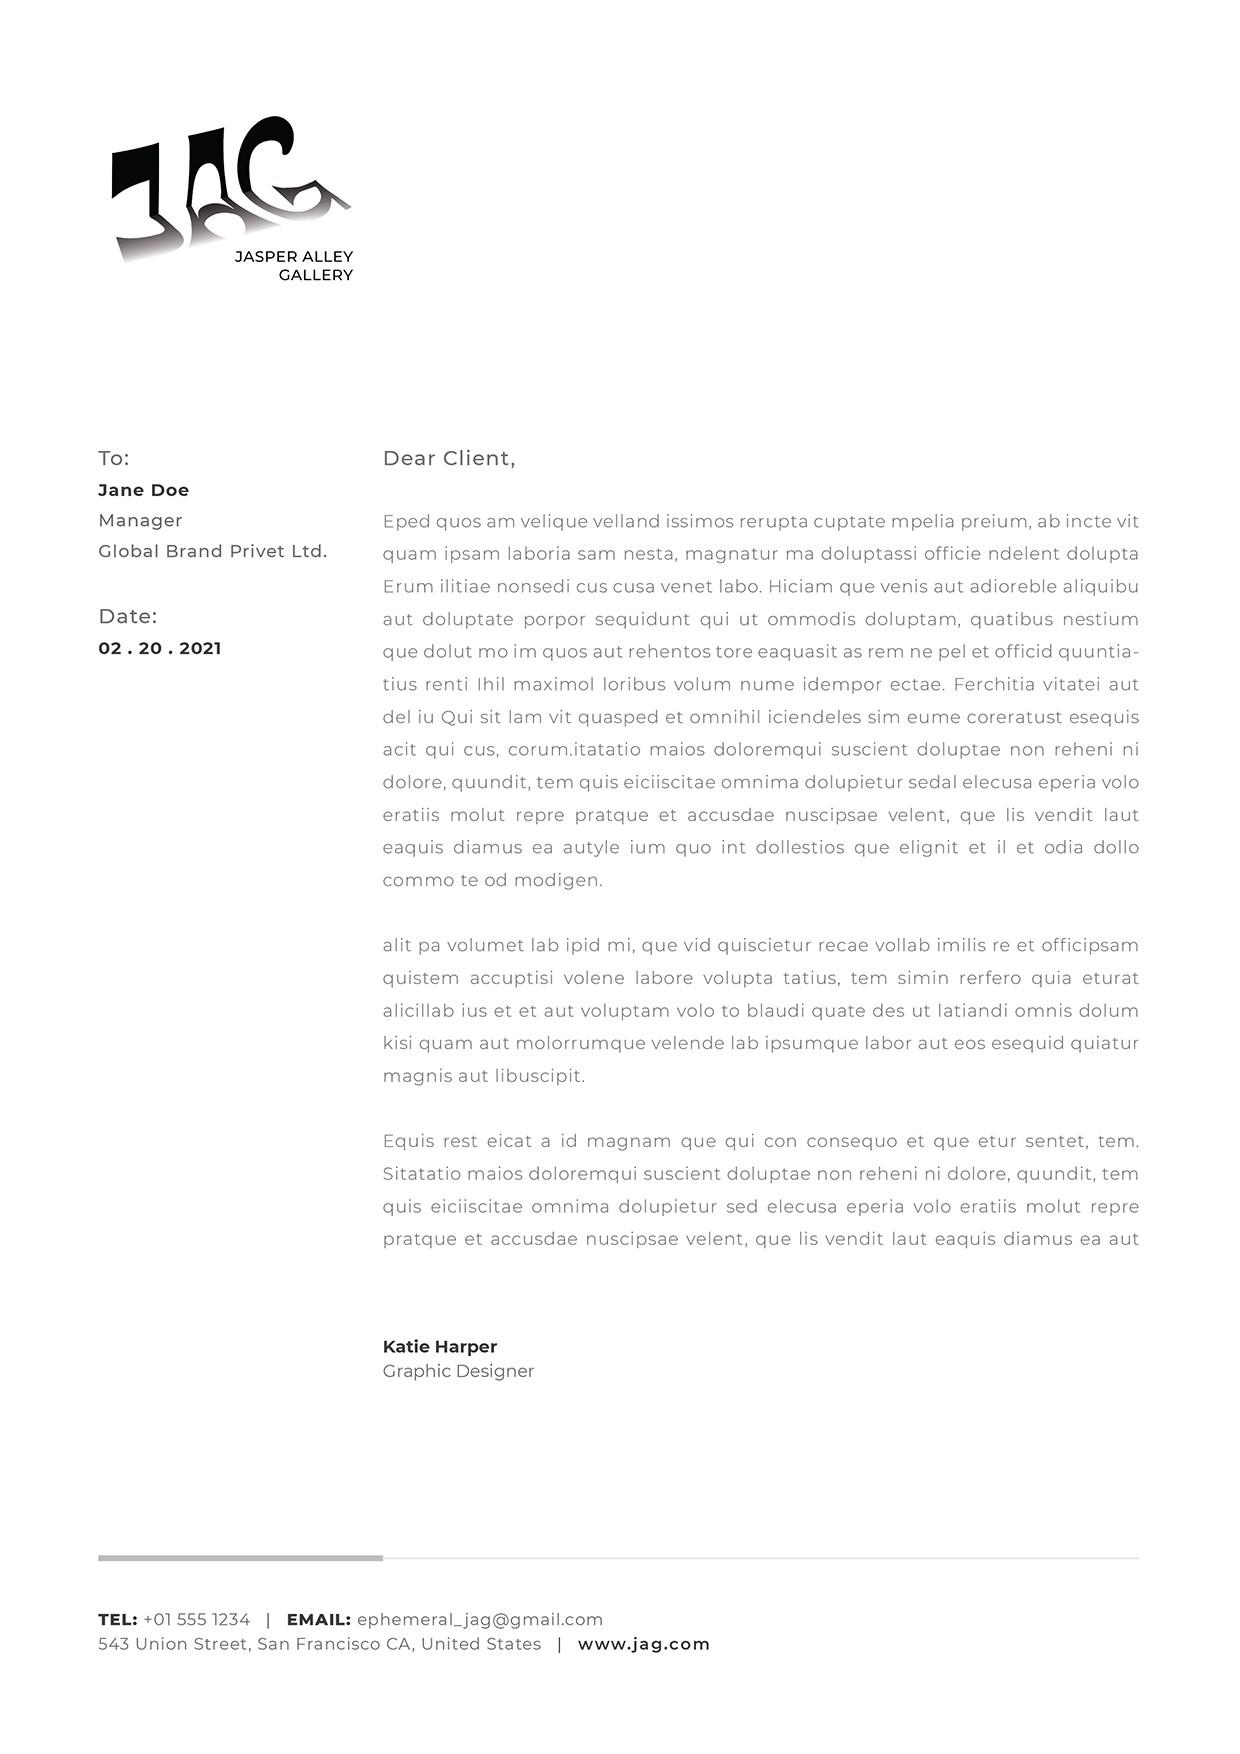 letterhead_bw.jpg